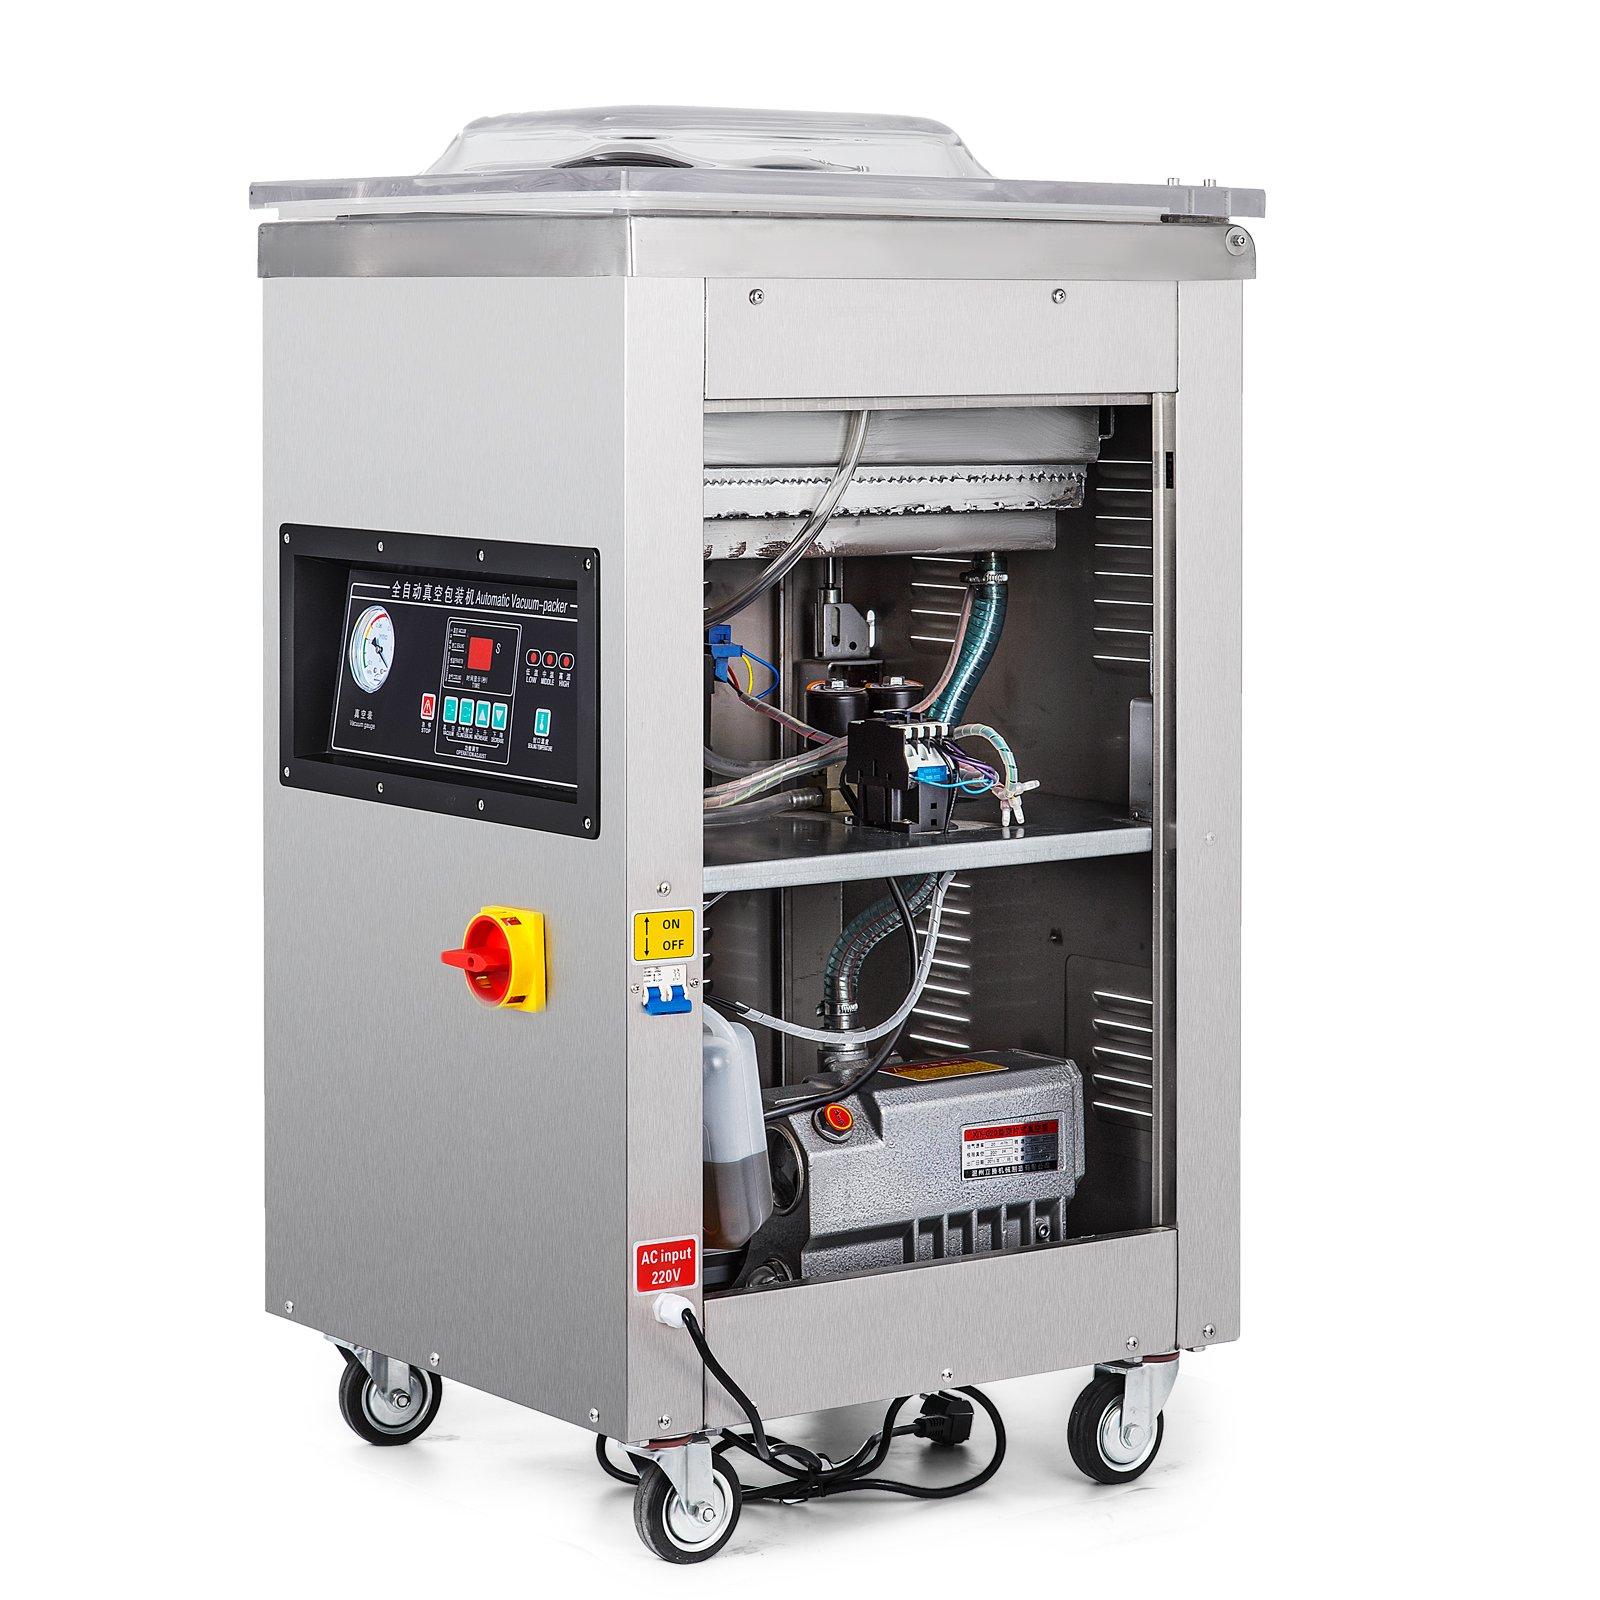 Happybuy DZ-400/2E Chamber Vacuum Sealer 1000W Vacuum Sealer Machine Automatic Vacuum Packing Sealing Sealer Machine for Home or Commercial Use (DZ-400/2E) by Happybuy (Image #4)